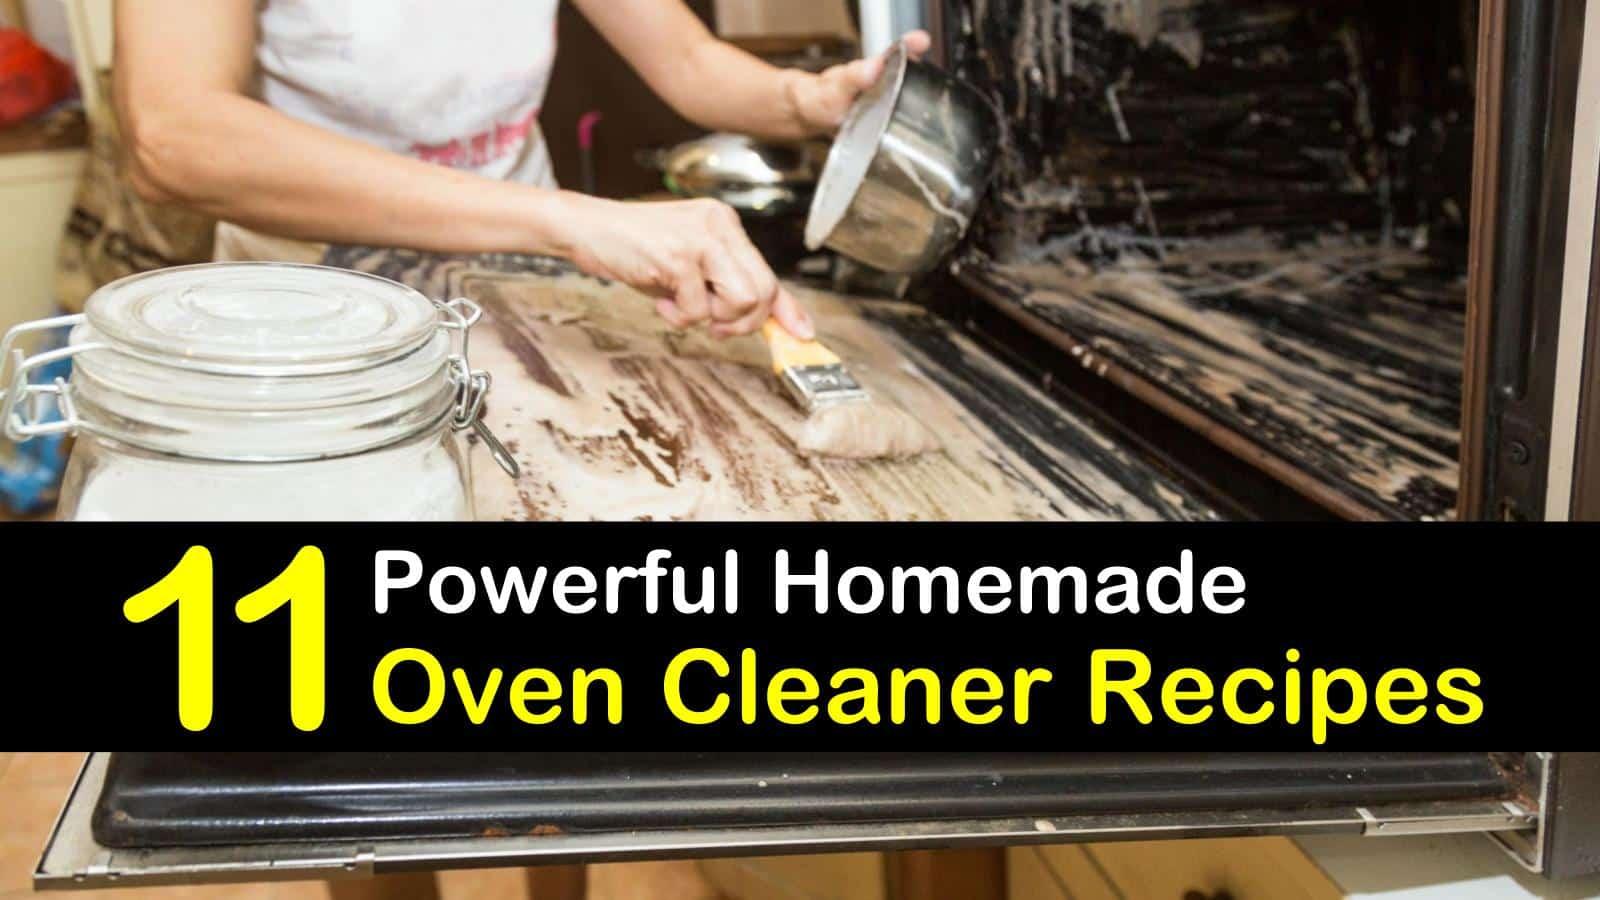 homemade oven cleaner titleimg1